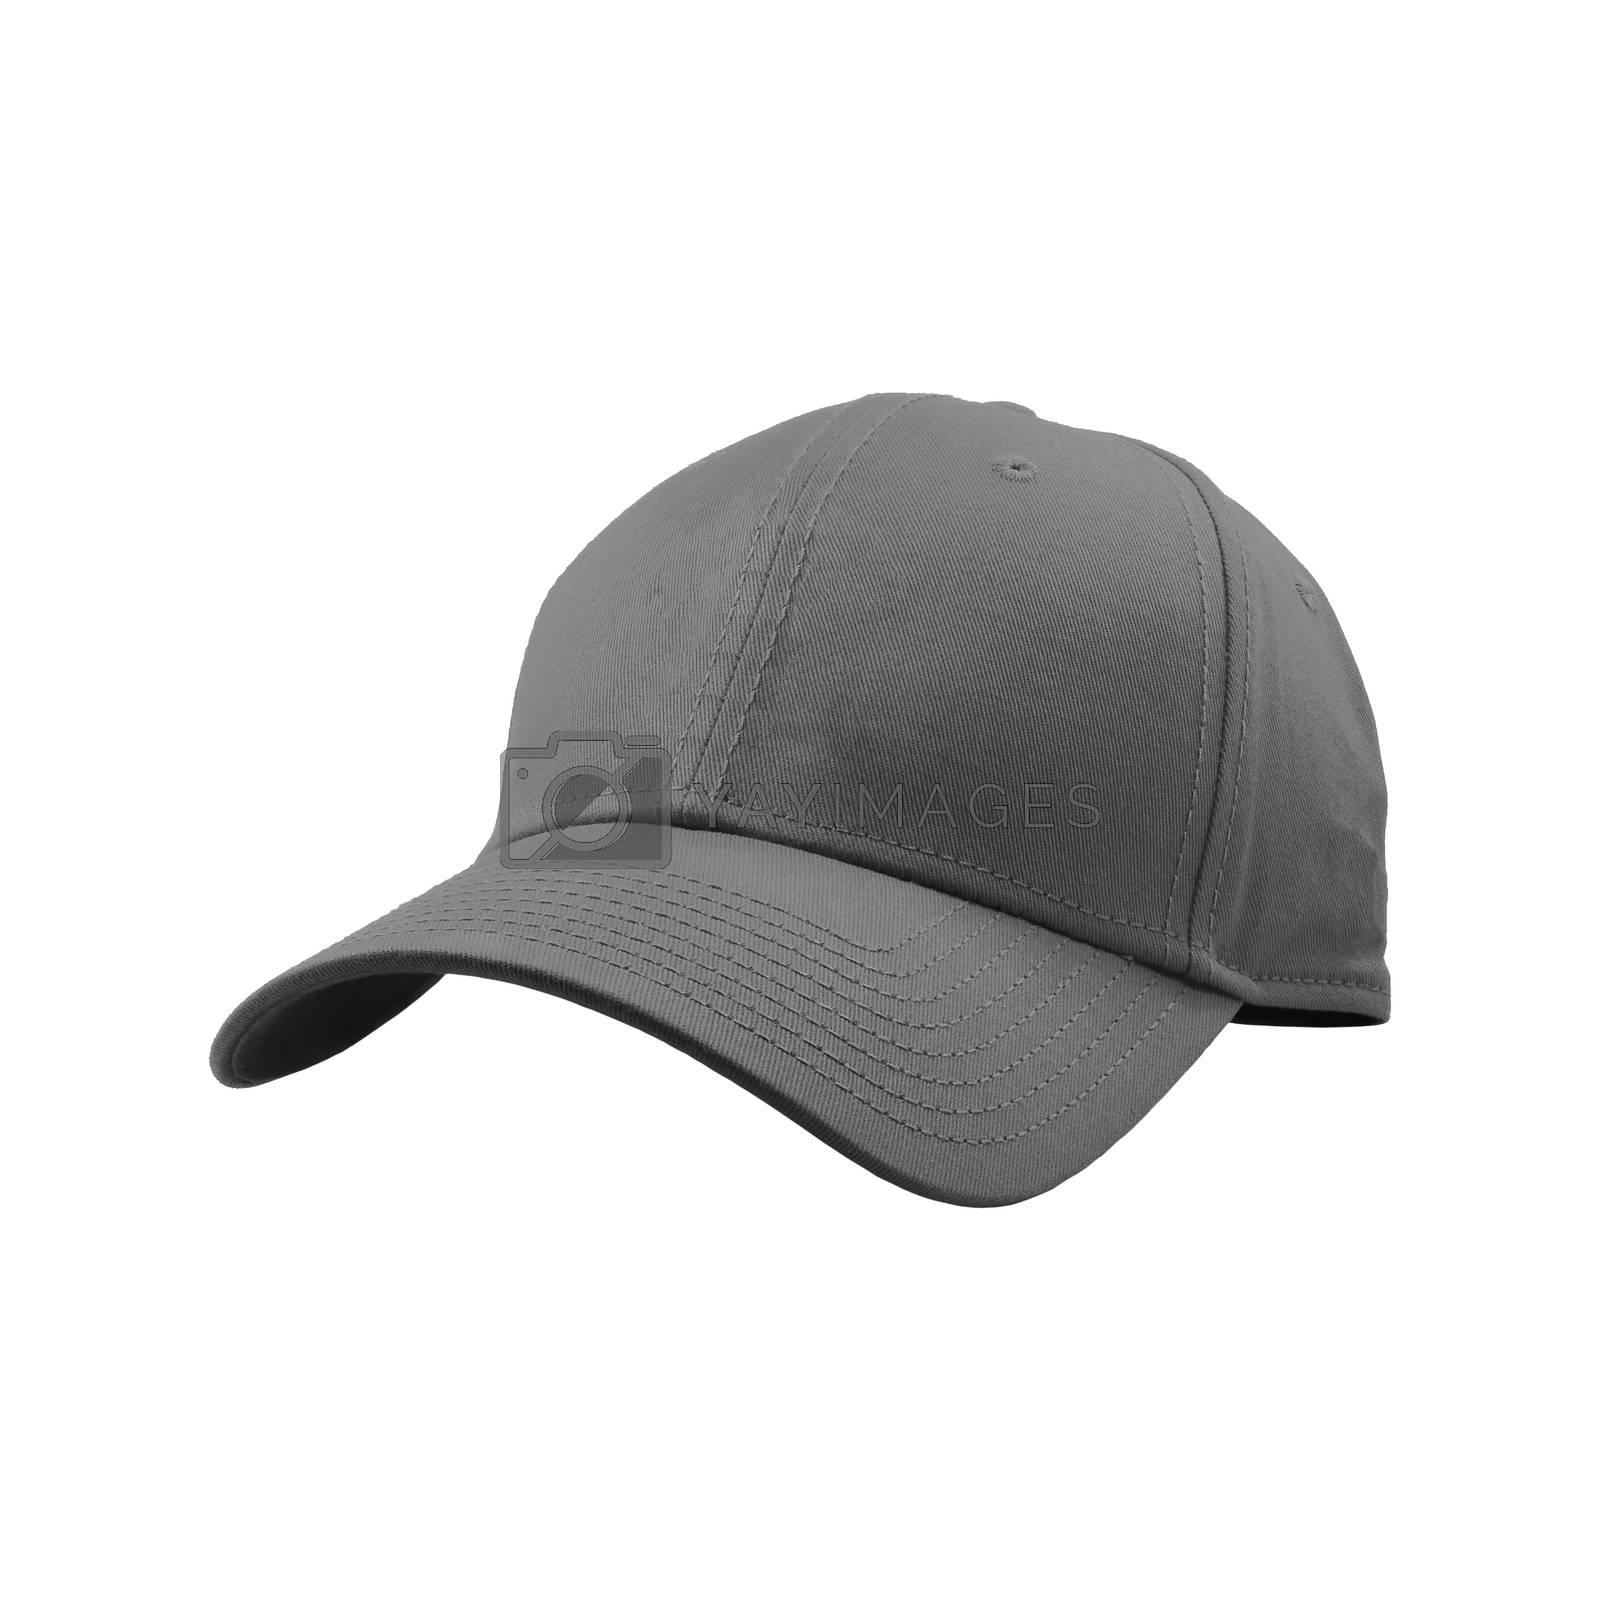 Colorful fashion cap isolated on white background.